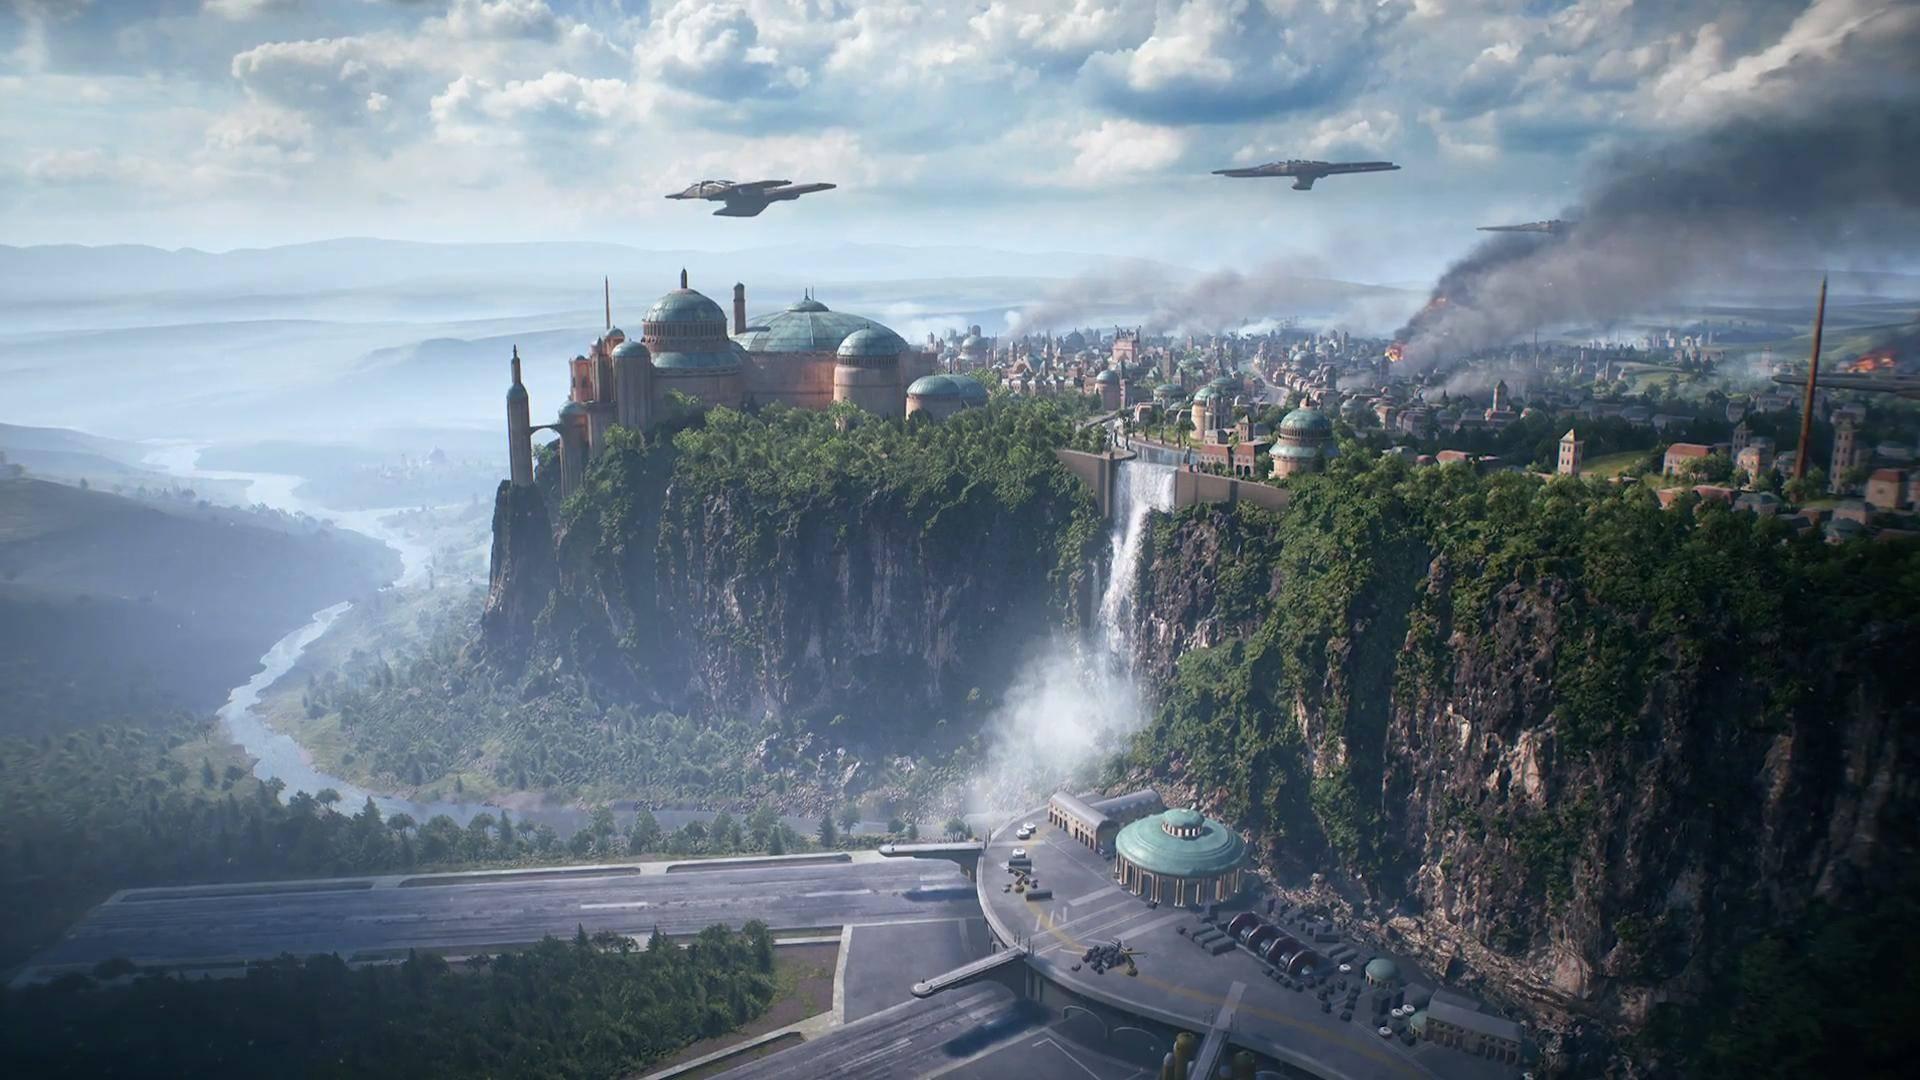 http://www.shooter-szene.de/wp-content/uploads/2017/06/Star-Wars-Battlefront-2-Naboo-Stadt-Theed.jpg